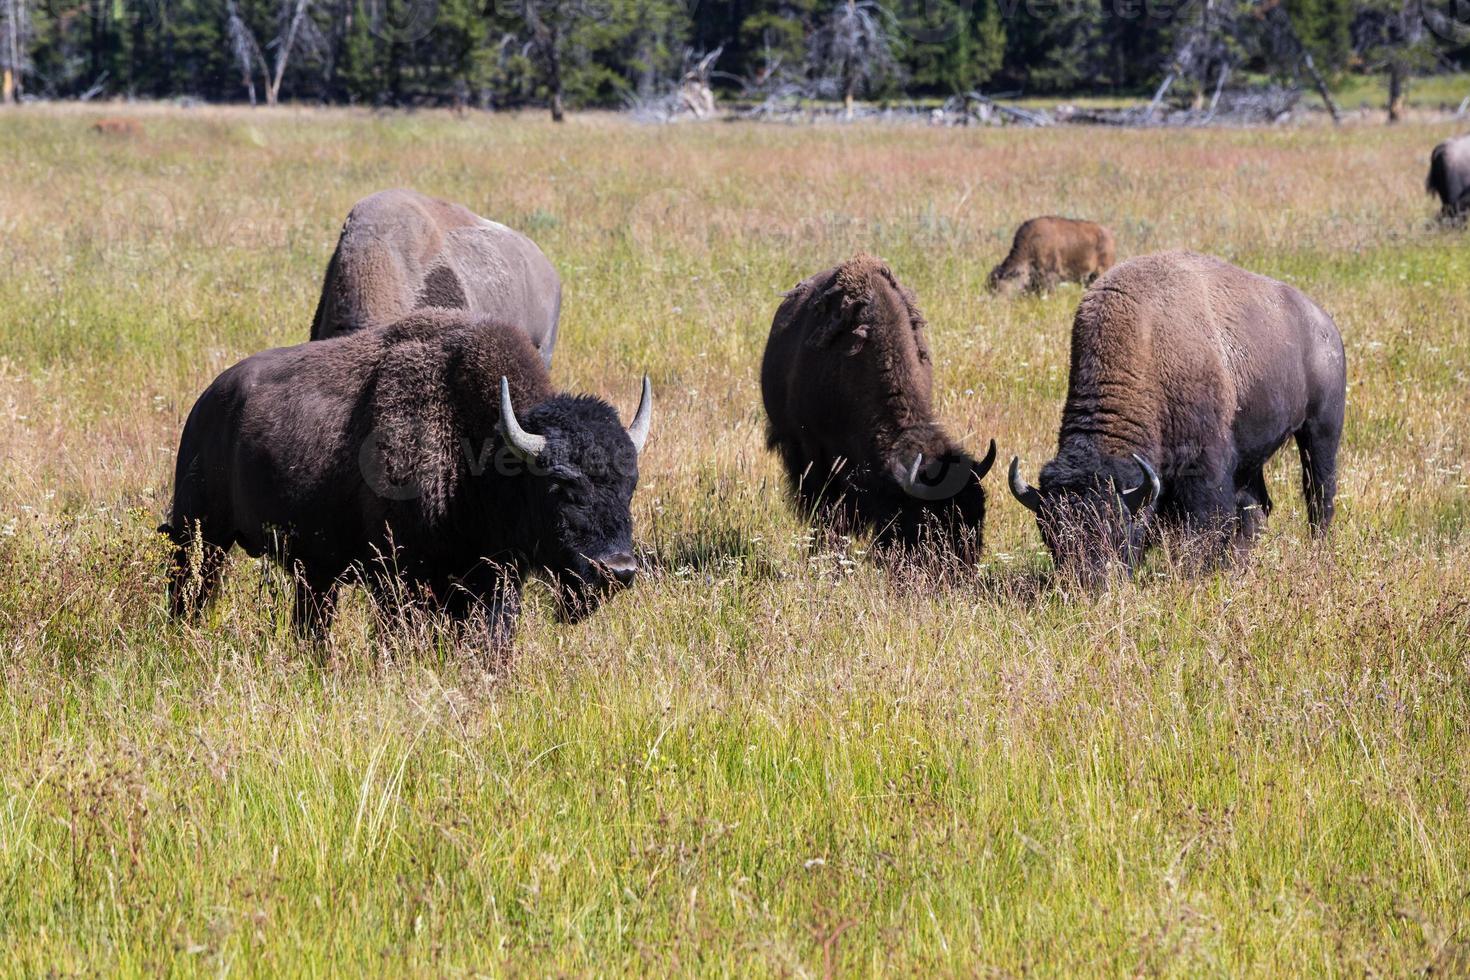 bisontes no parque nacional de yellowstone, wyoming, eua foto